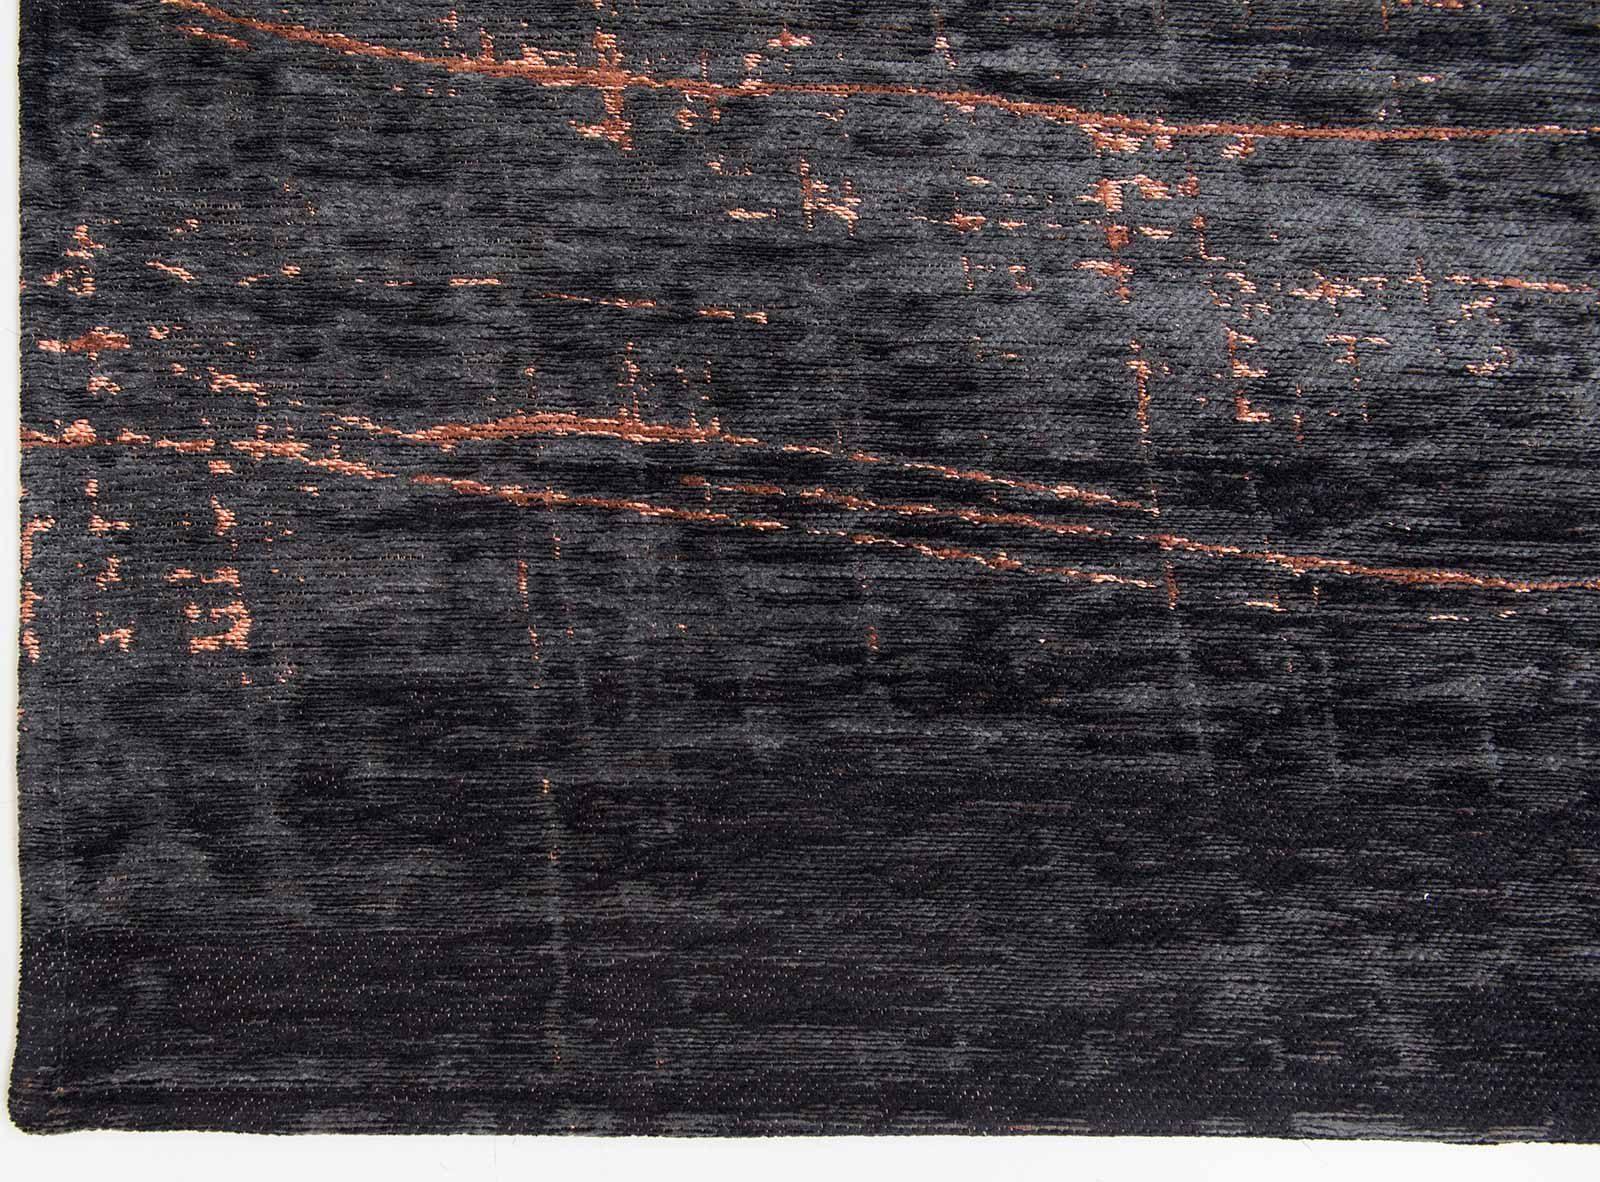 tapijt Louis De Poortere LX8925 Mad Men Griff Soho Copper corner